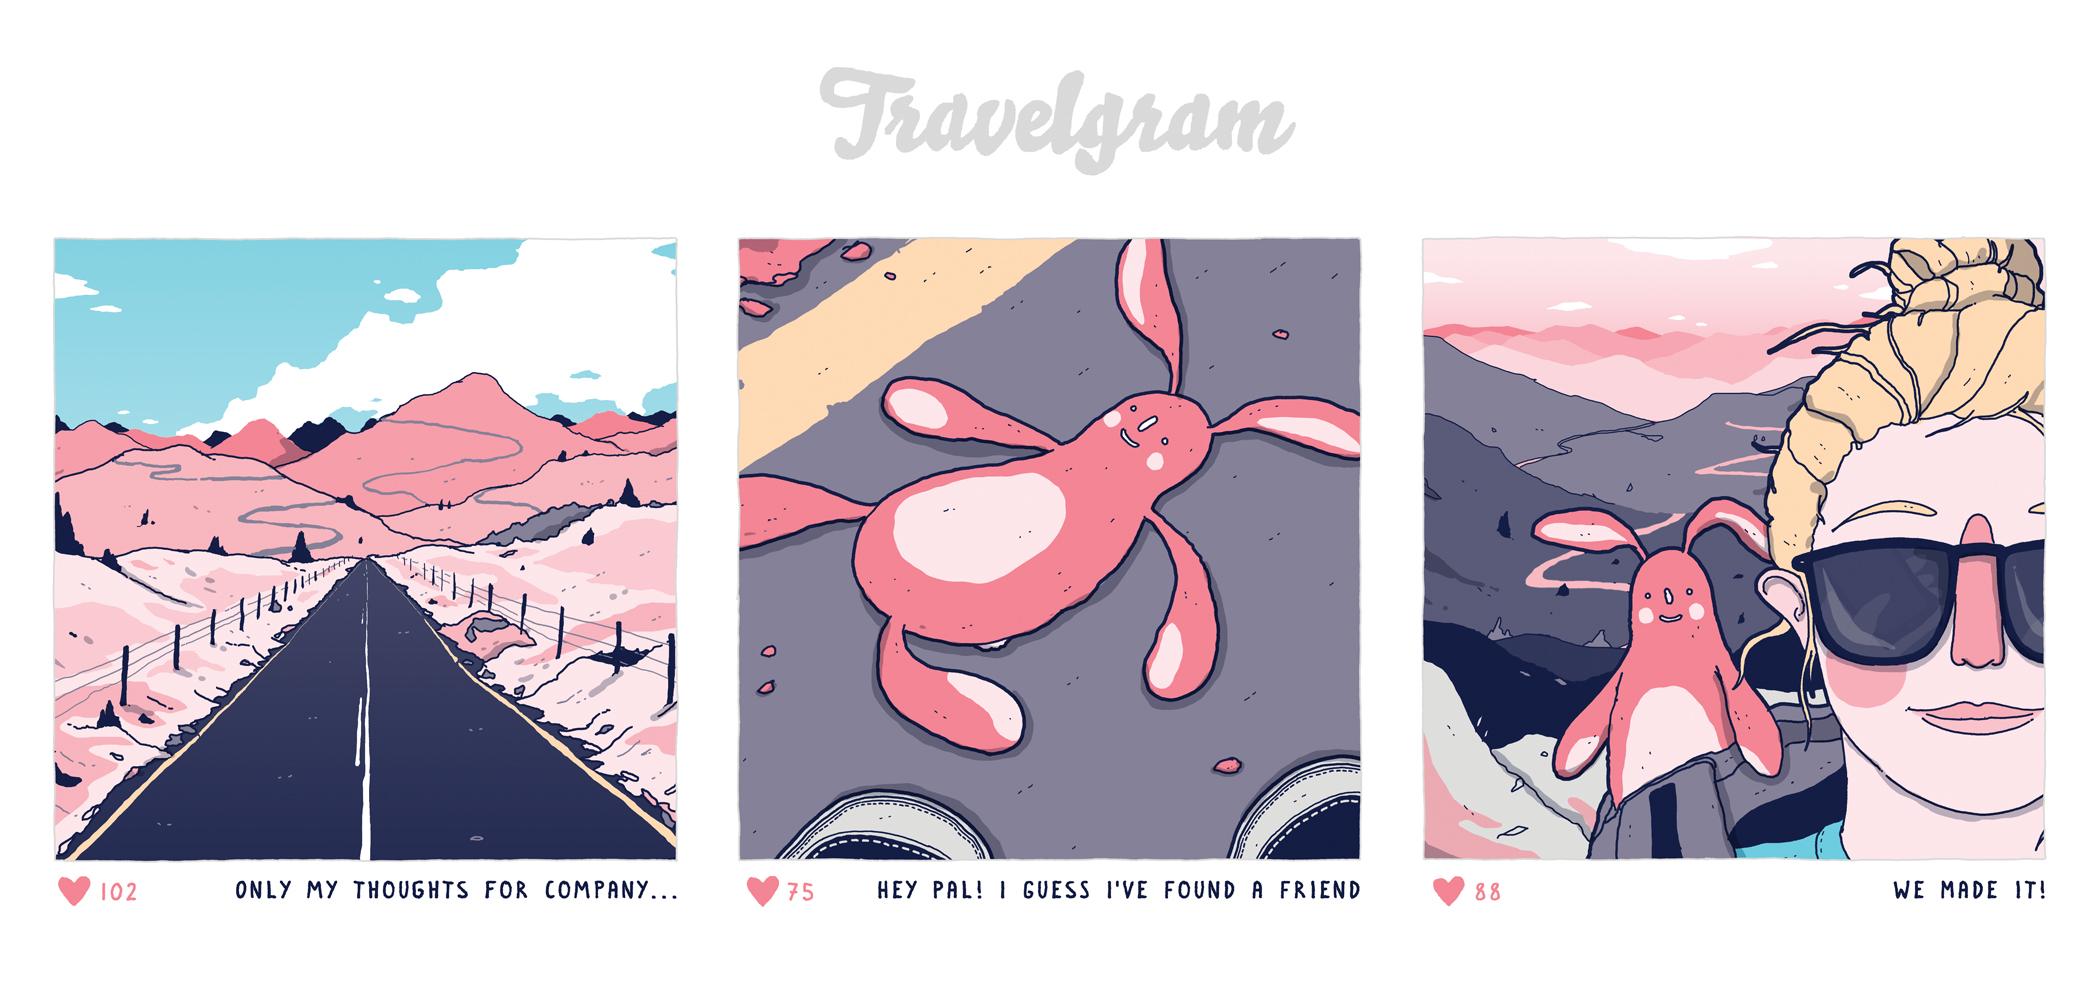 travelgram-web-07-solo-travel.jpg